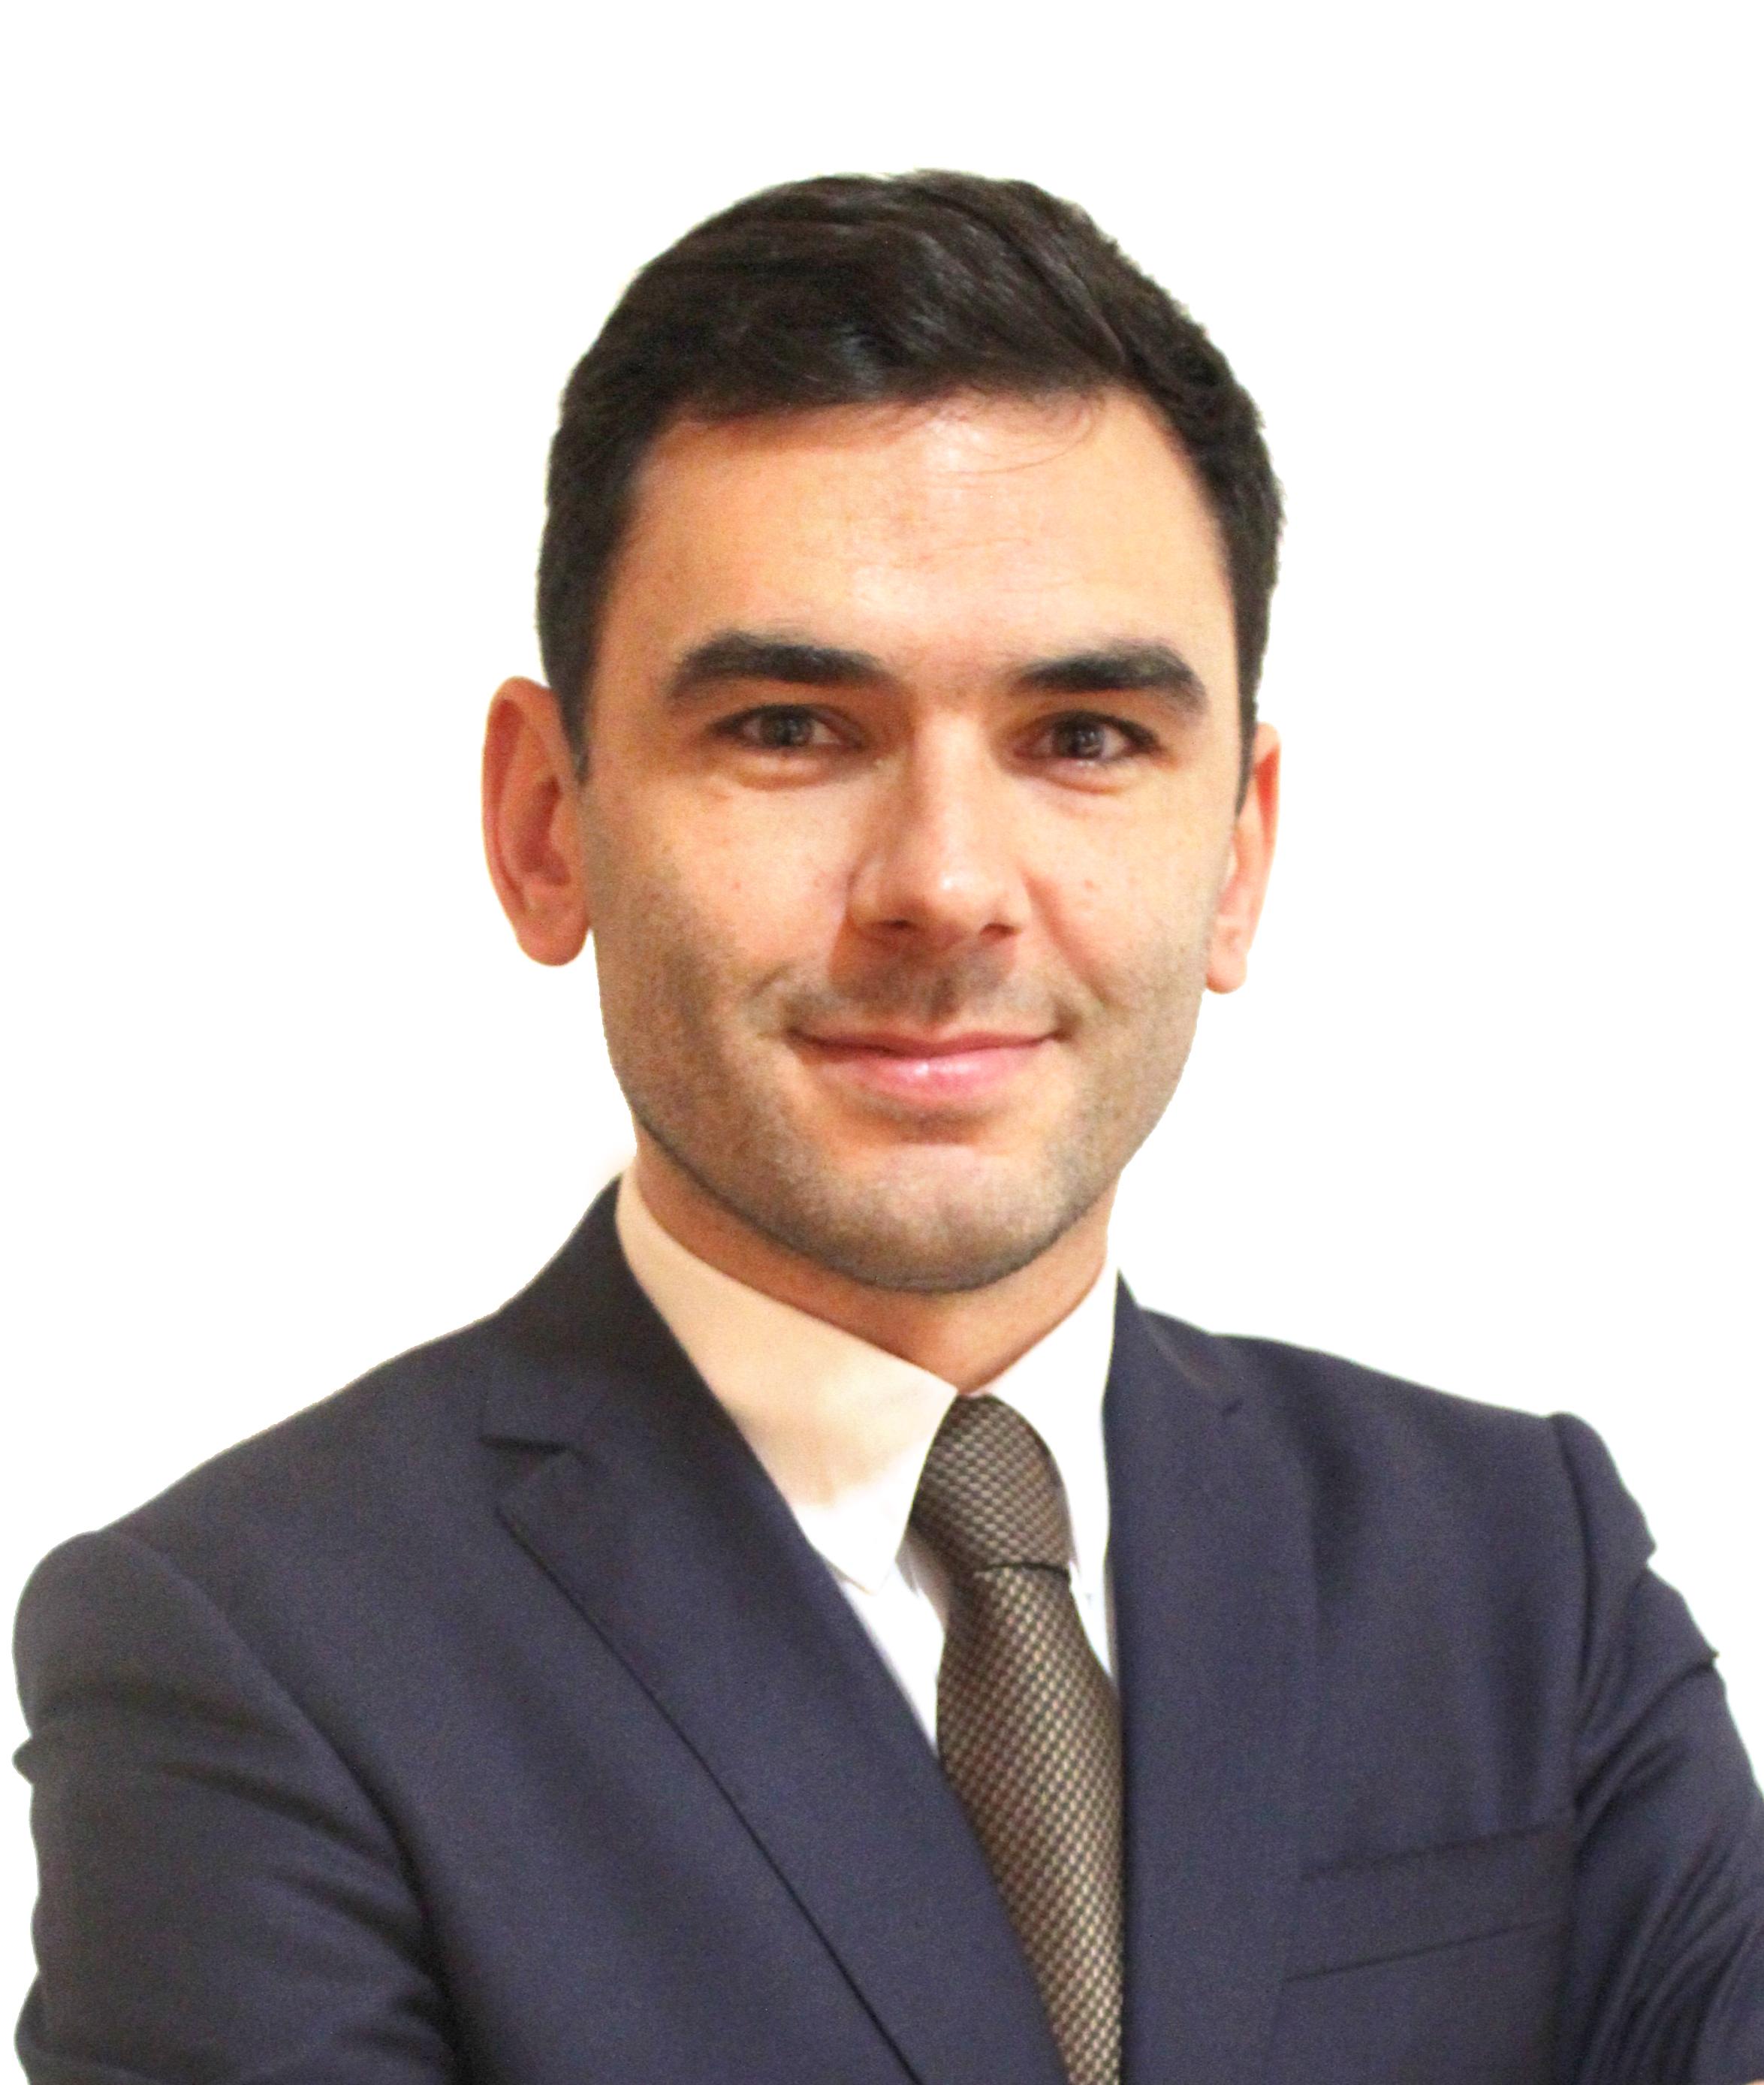 Jorge Silva Martins - PLMJ